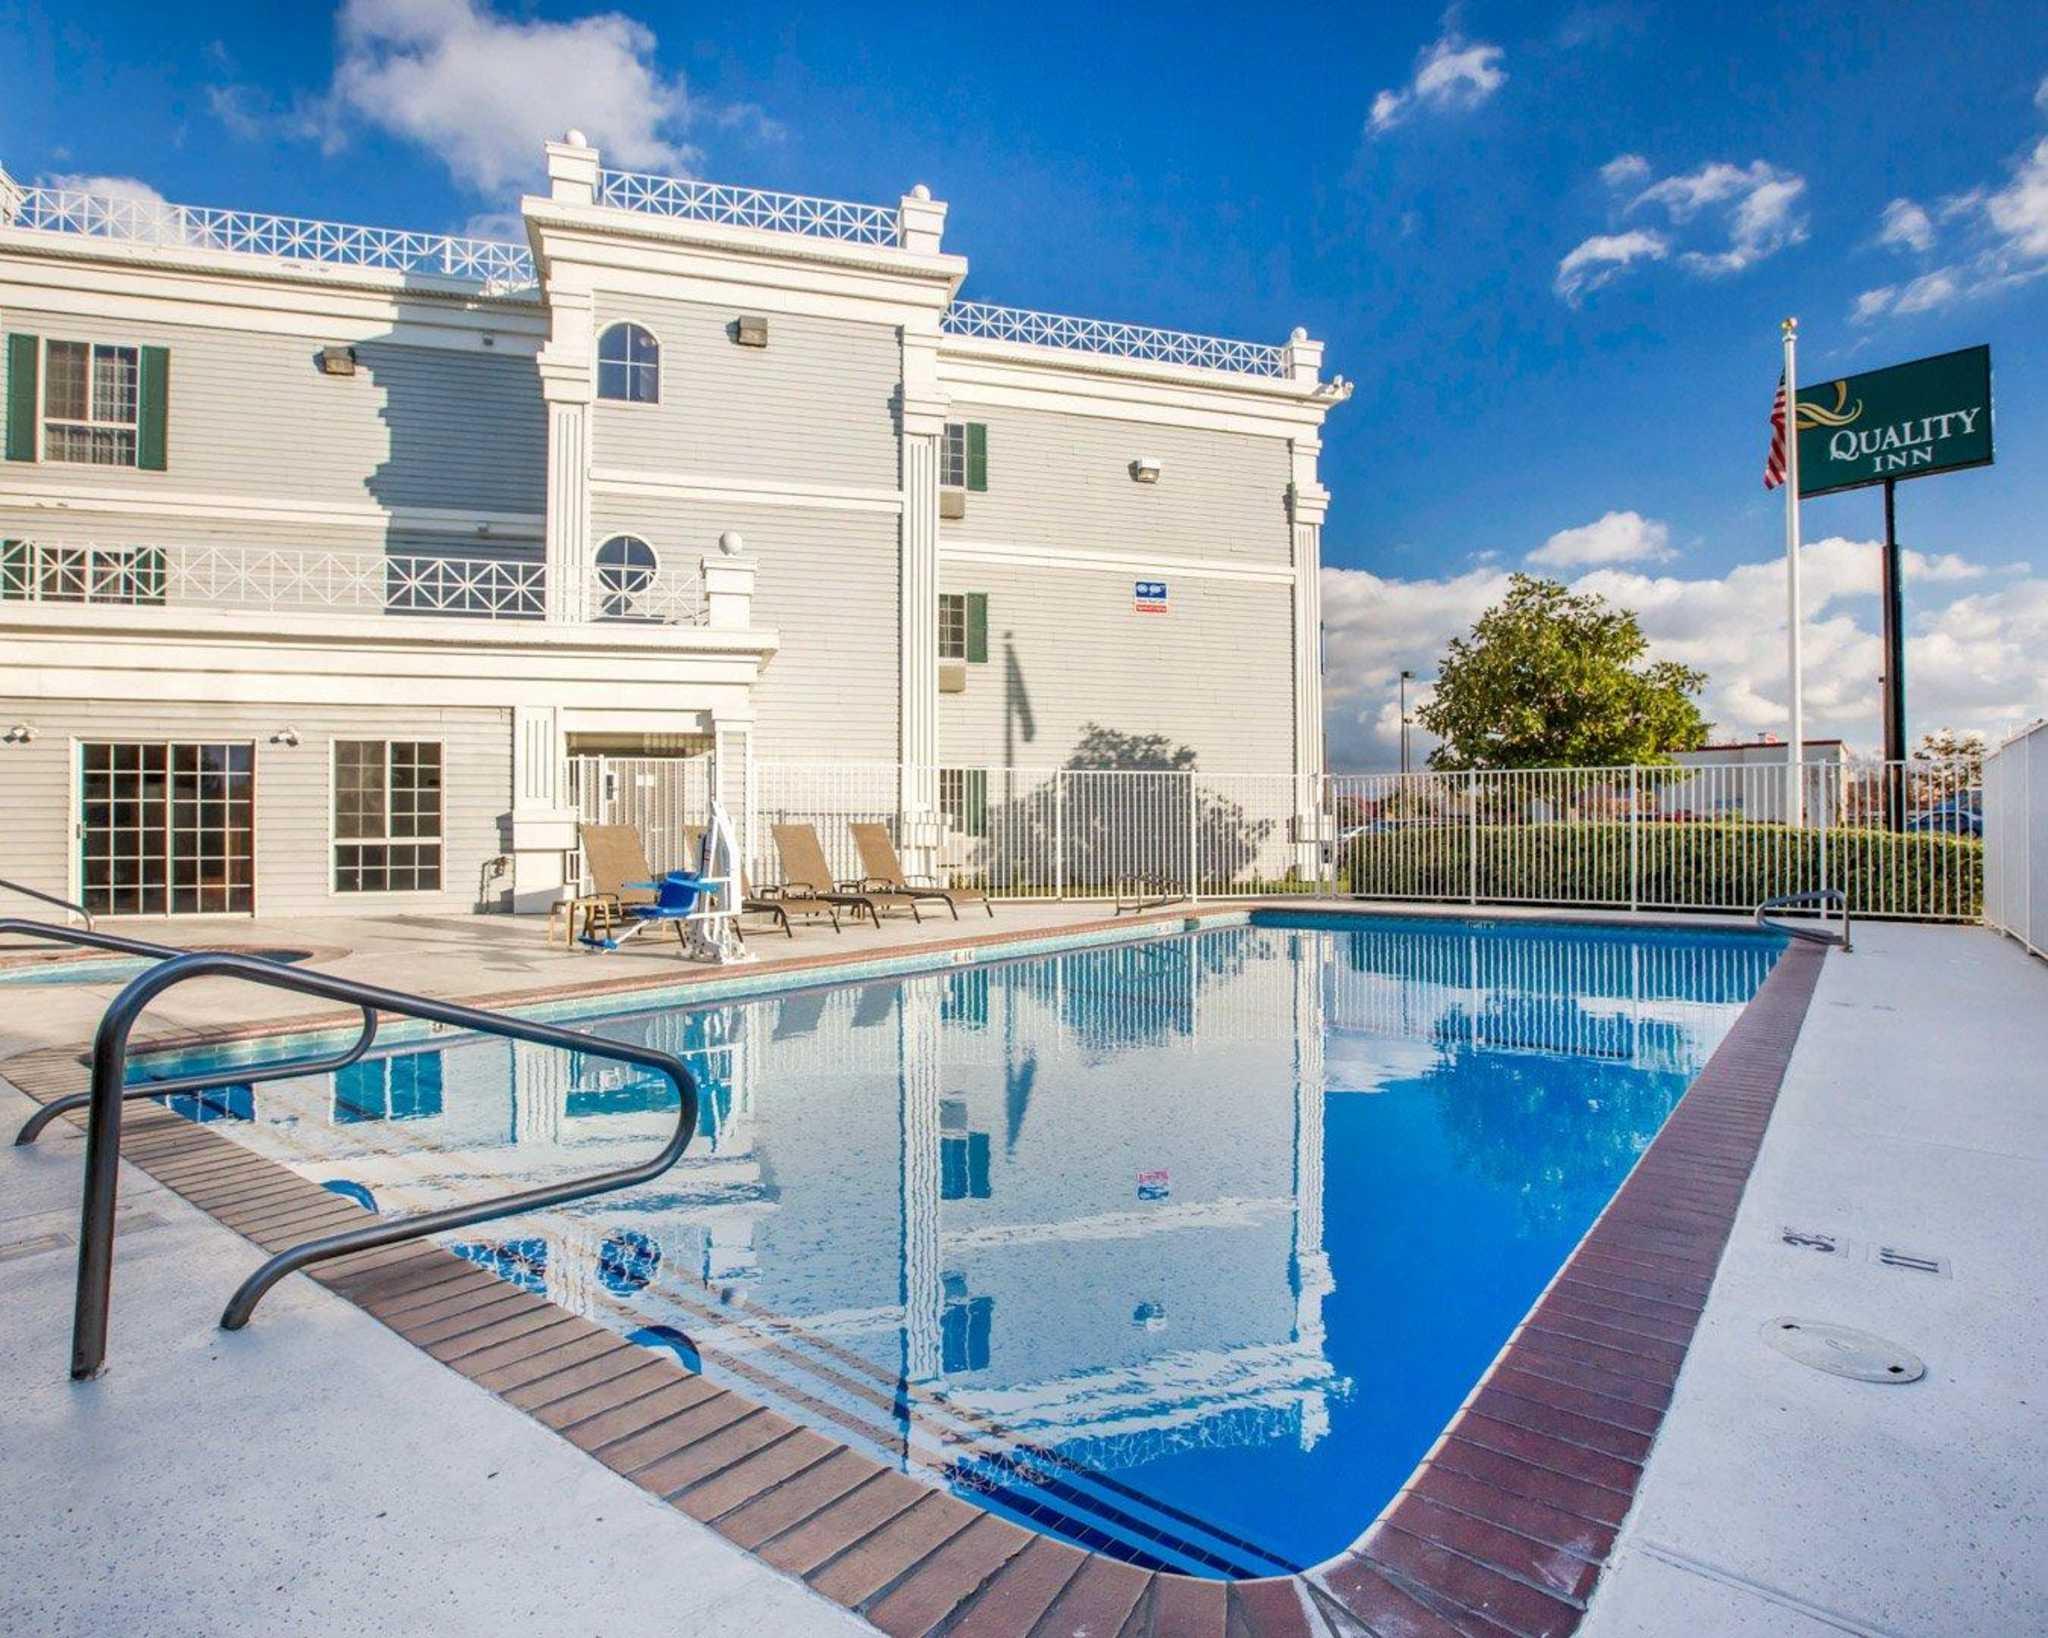 Tulare Ca Hotels Motels